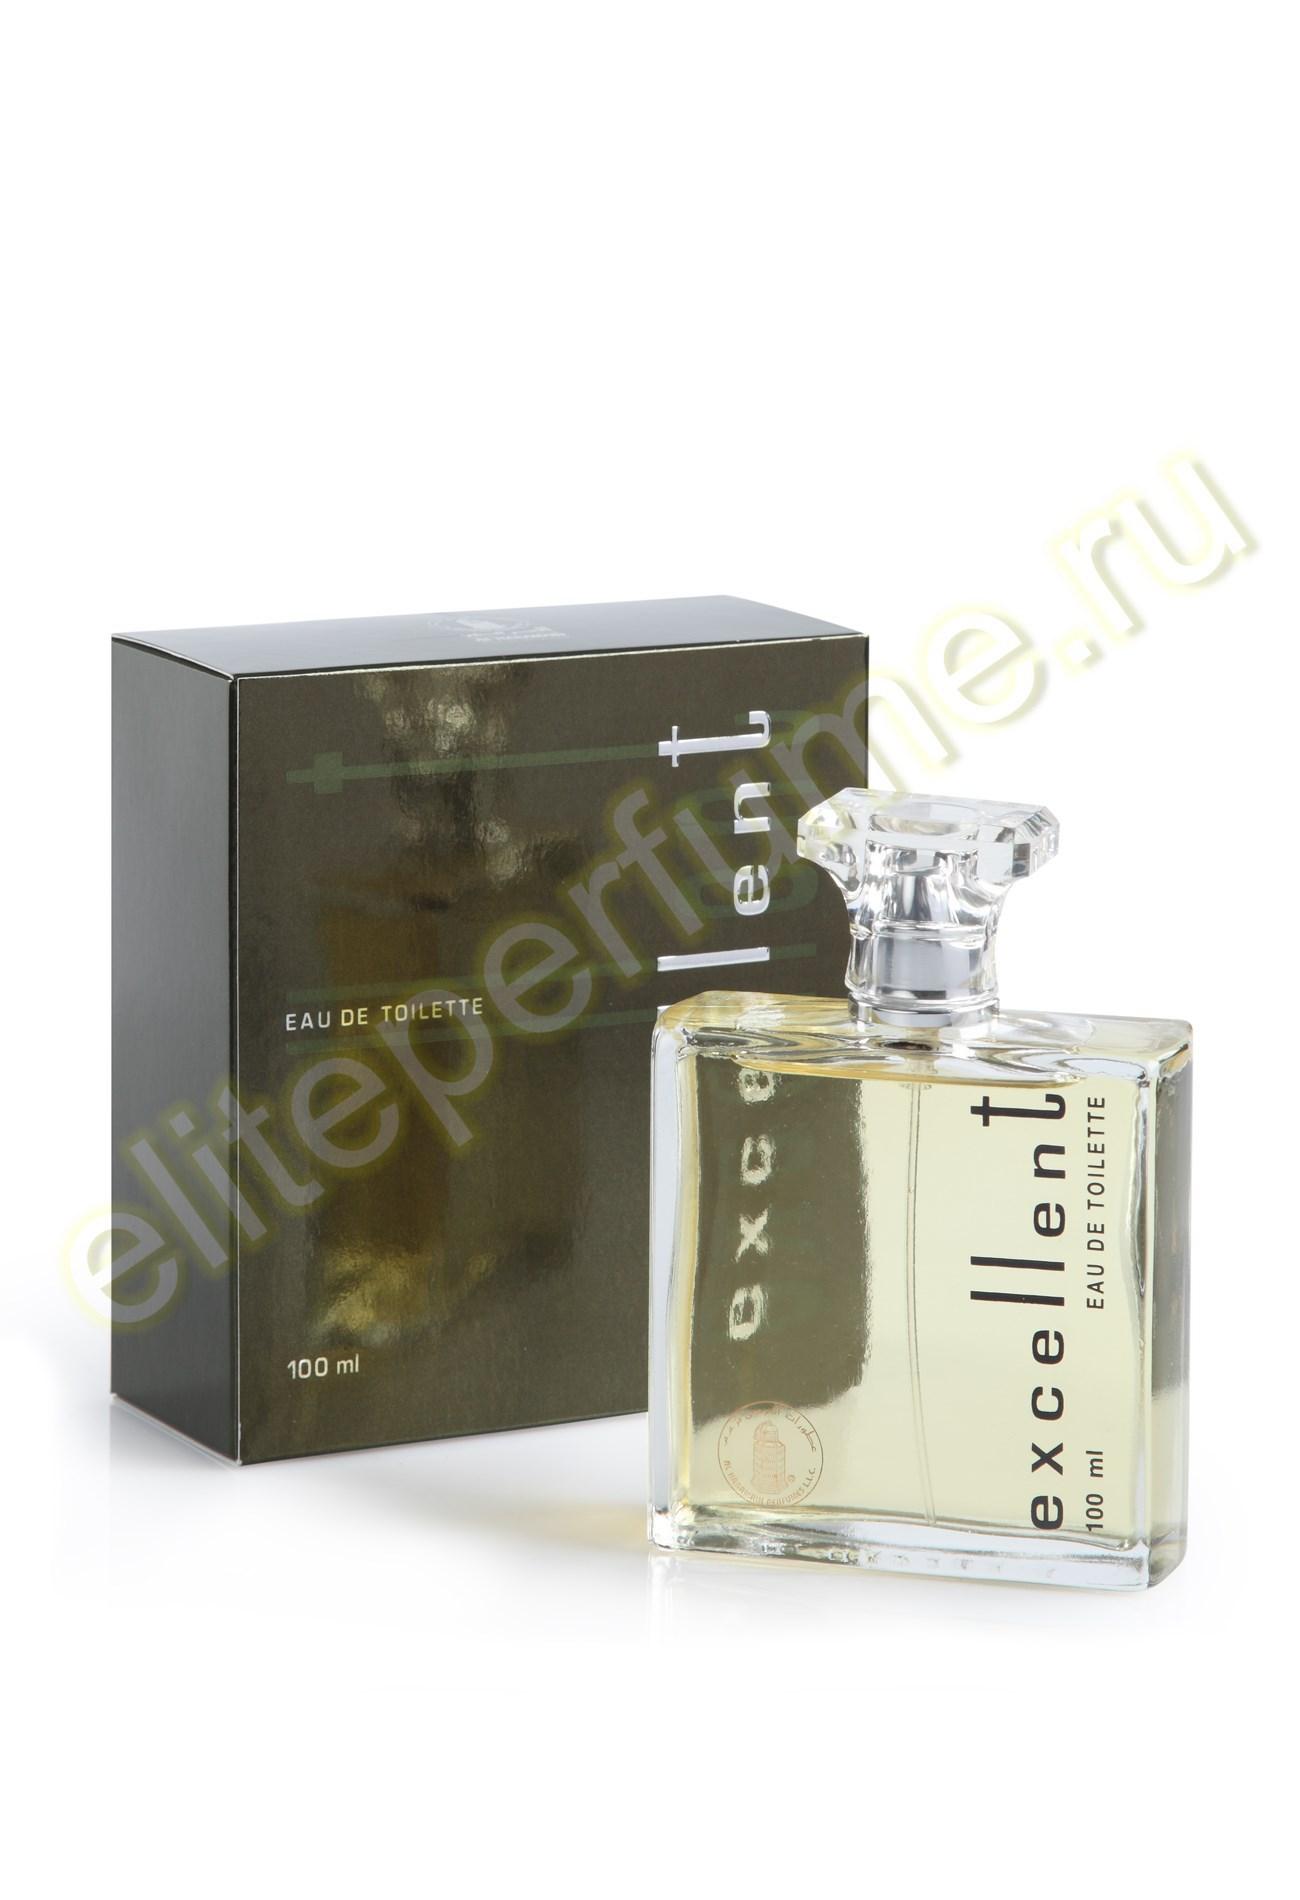 Excellent Великолепие мужская туалетная вода 100 мл спрей от Аль Харамайн Al Haramain Perfumes